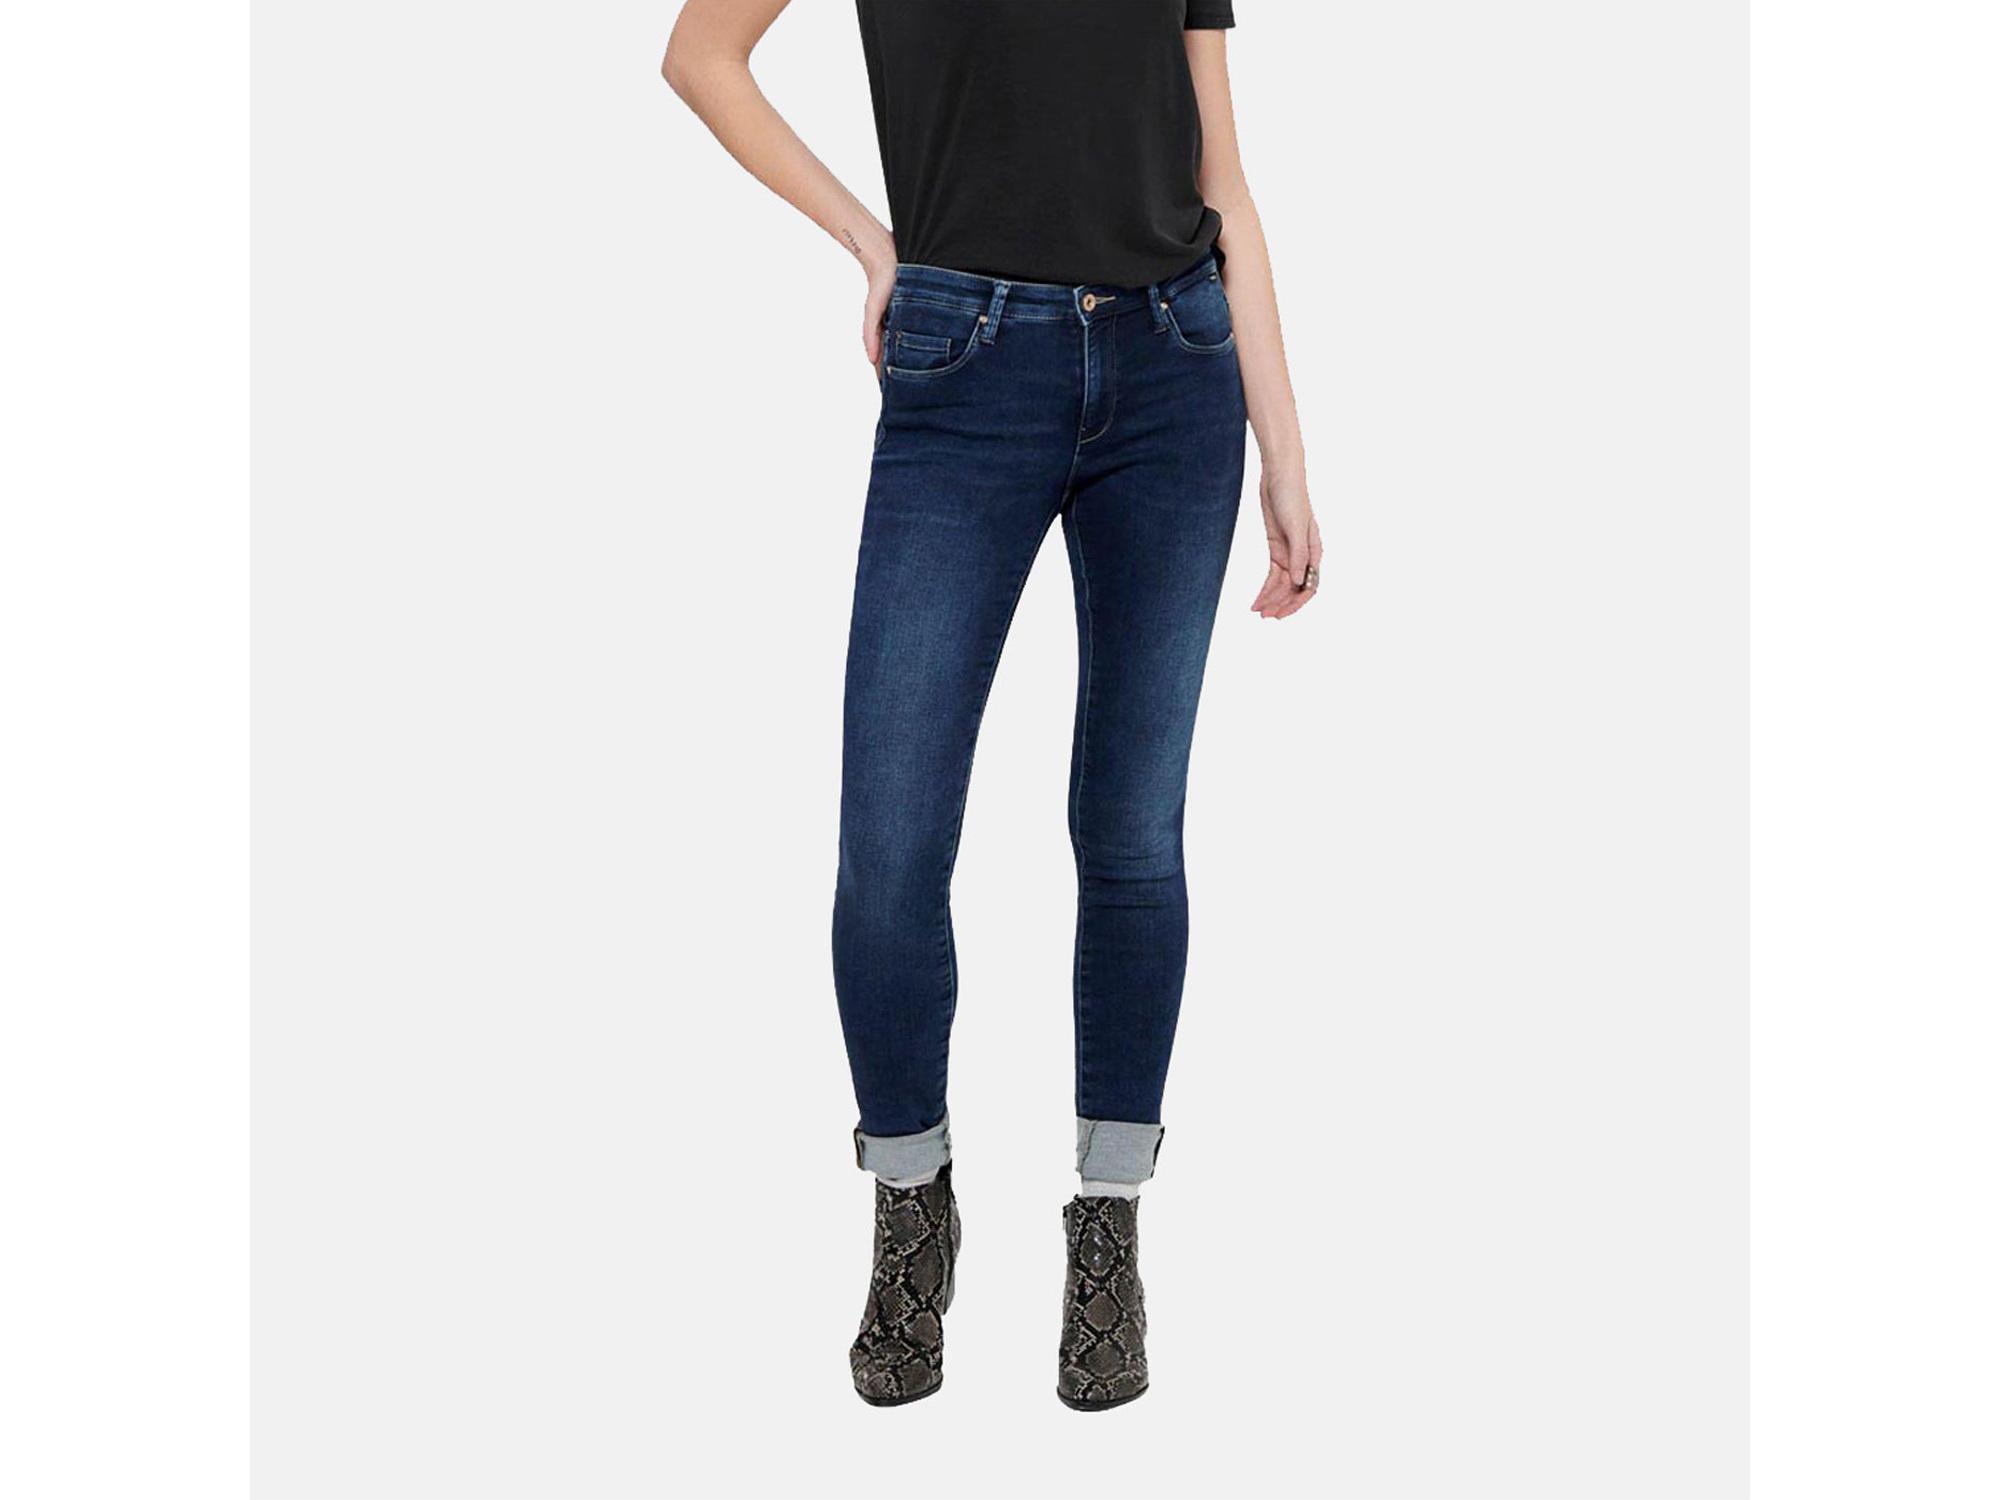 ONLY Ženski jeans 15195787 DARK BLUE DENIM 25/32 / DENIM MODRA